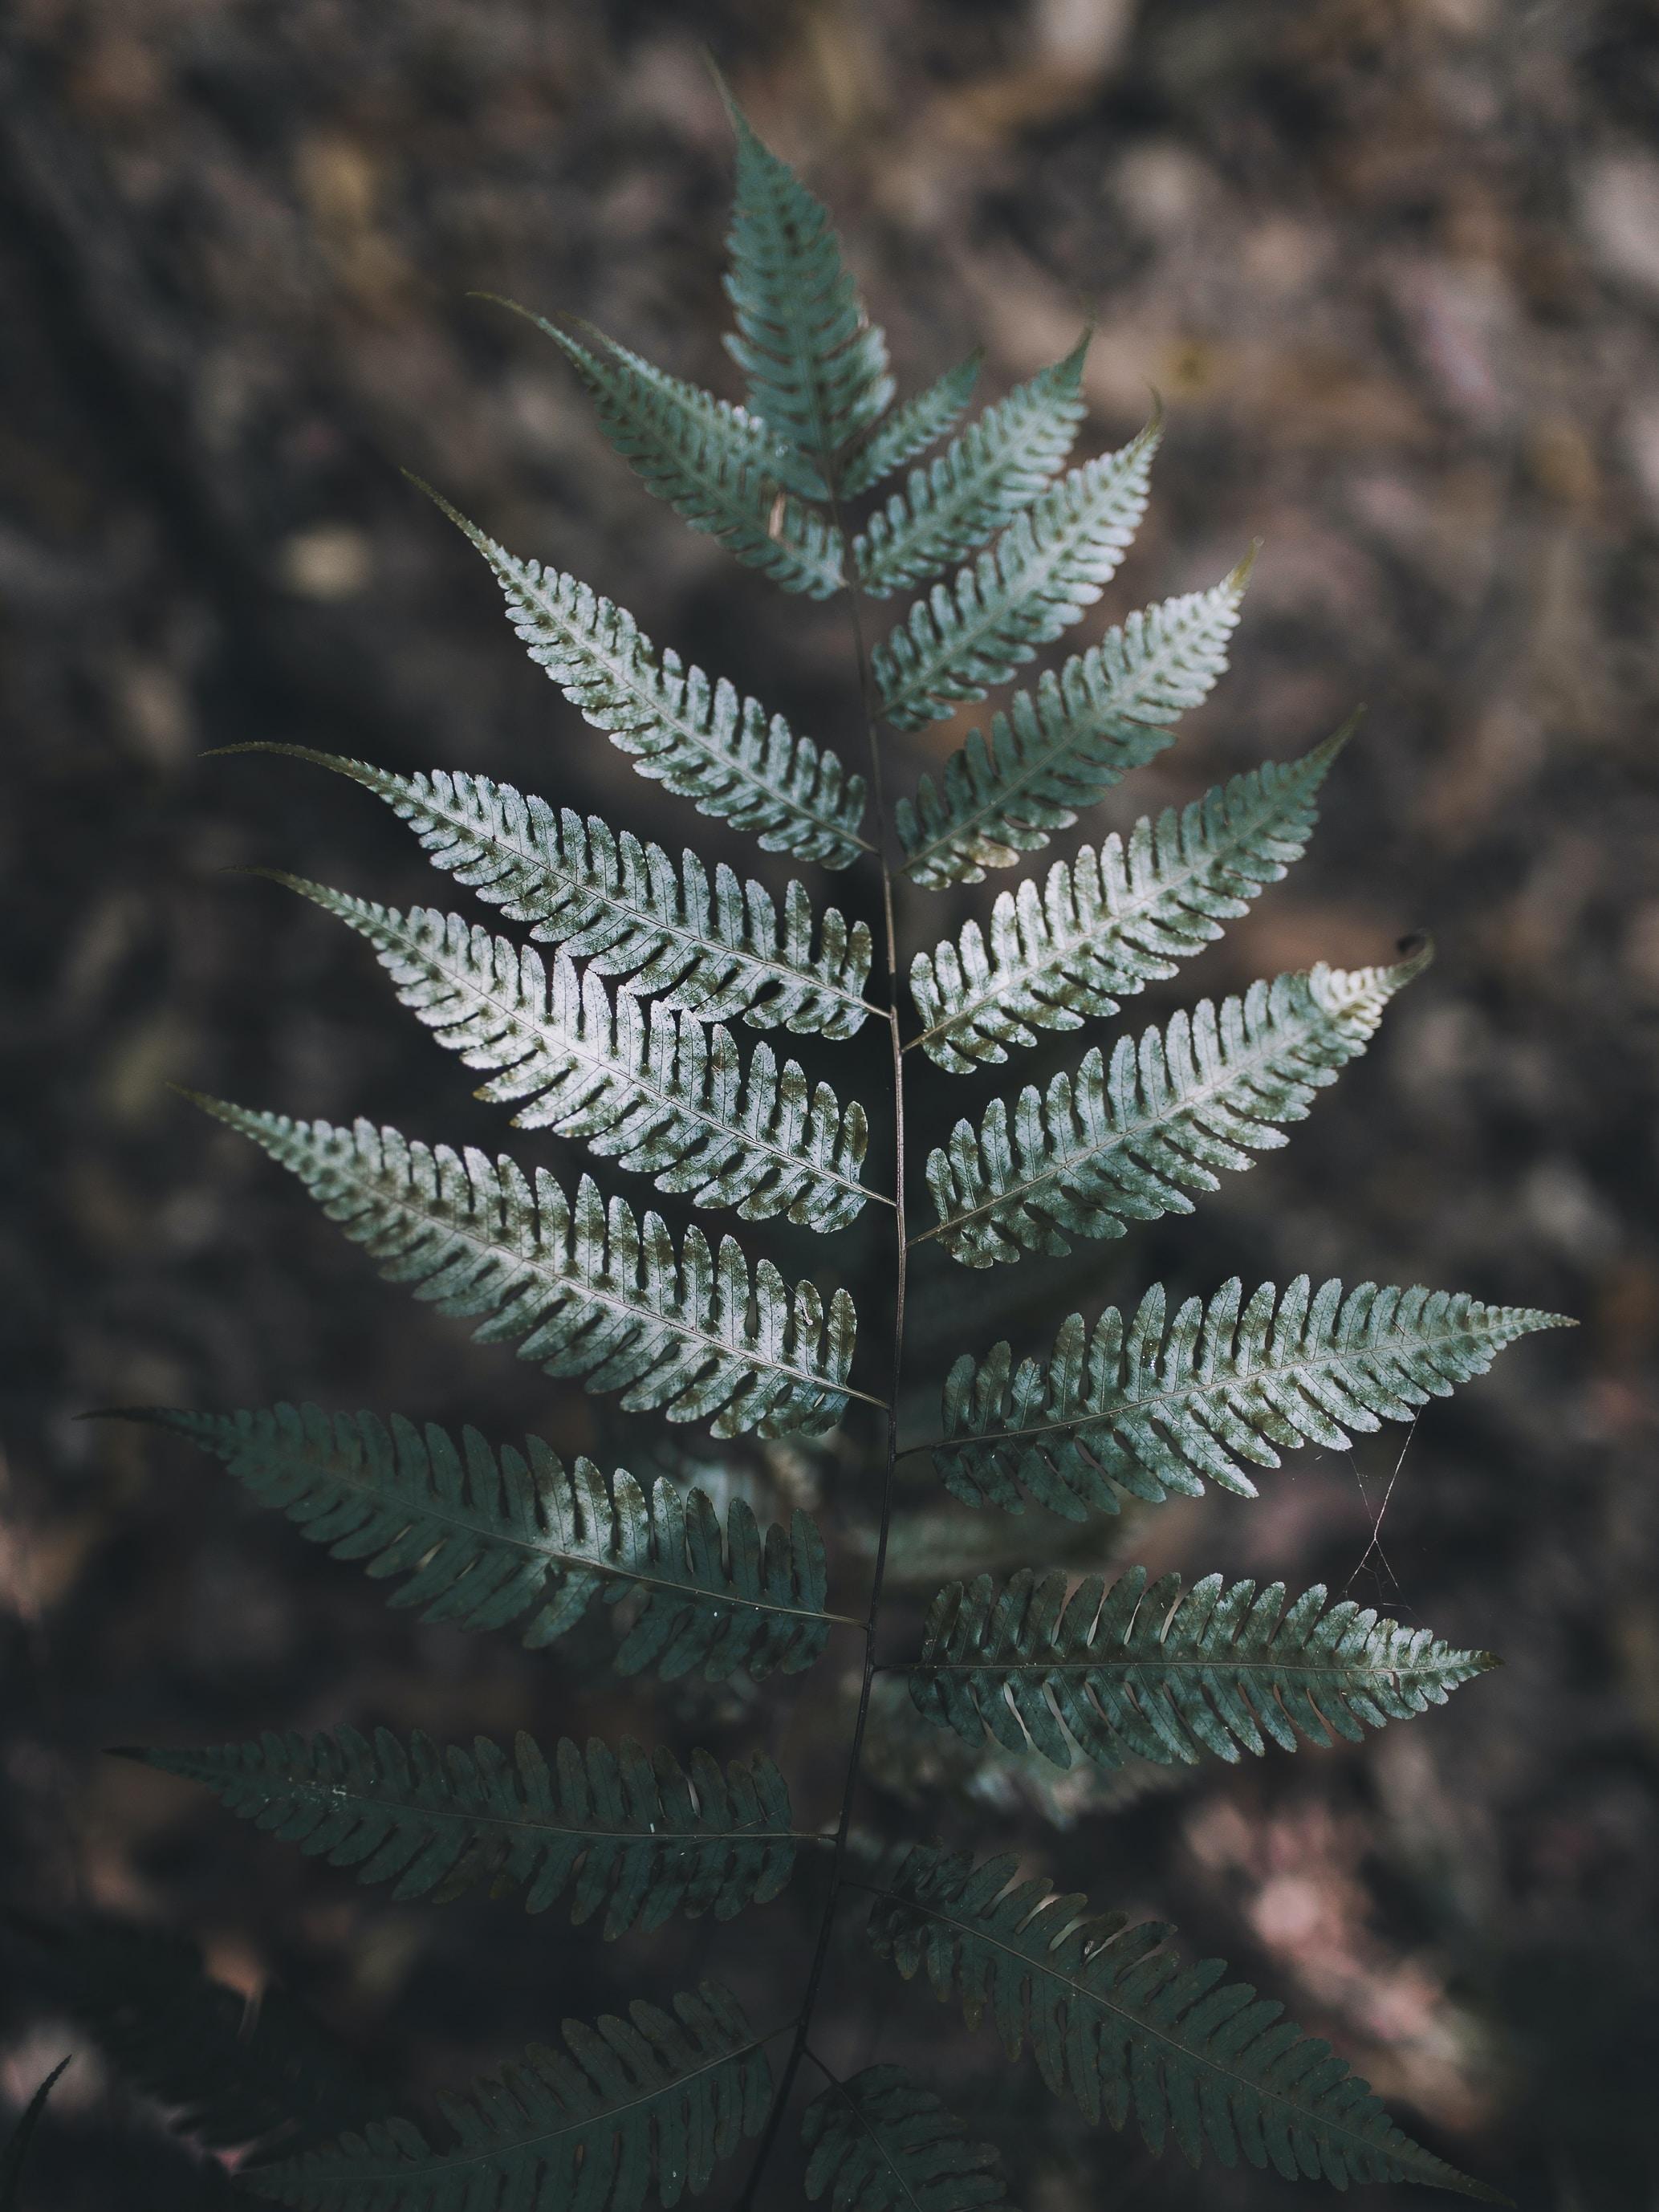 A top view of a dark green fern branch